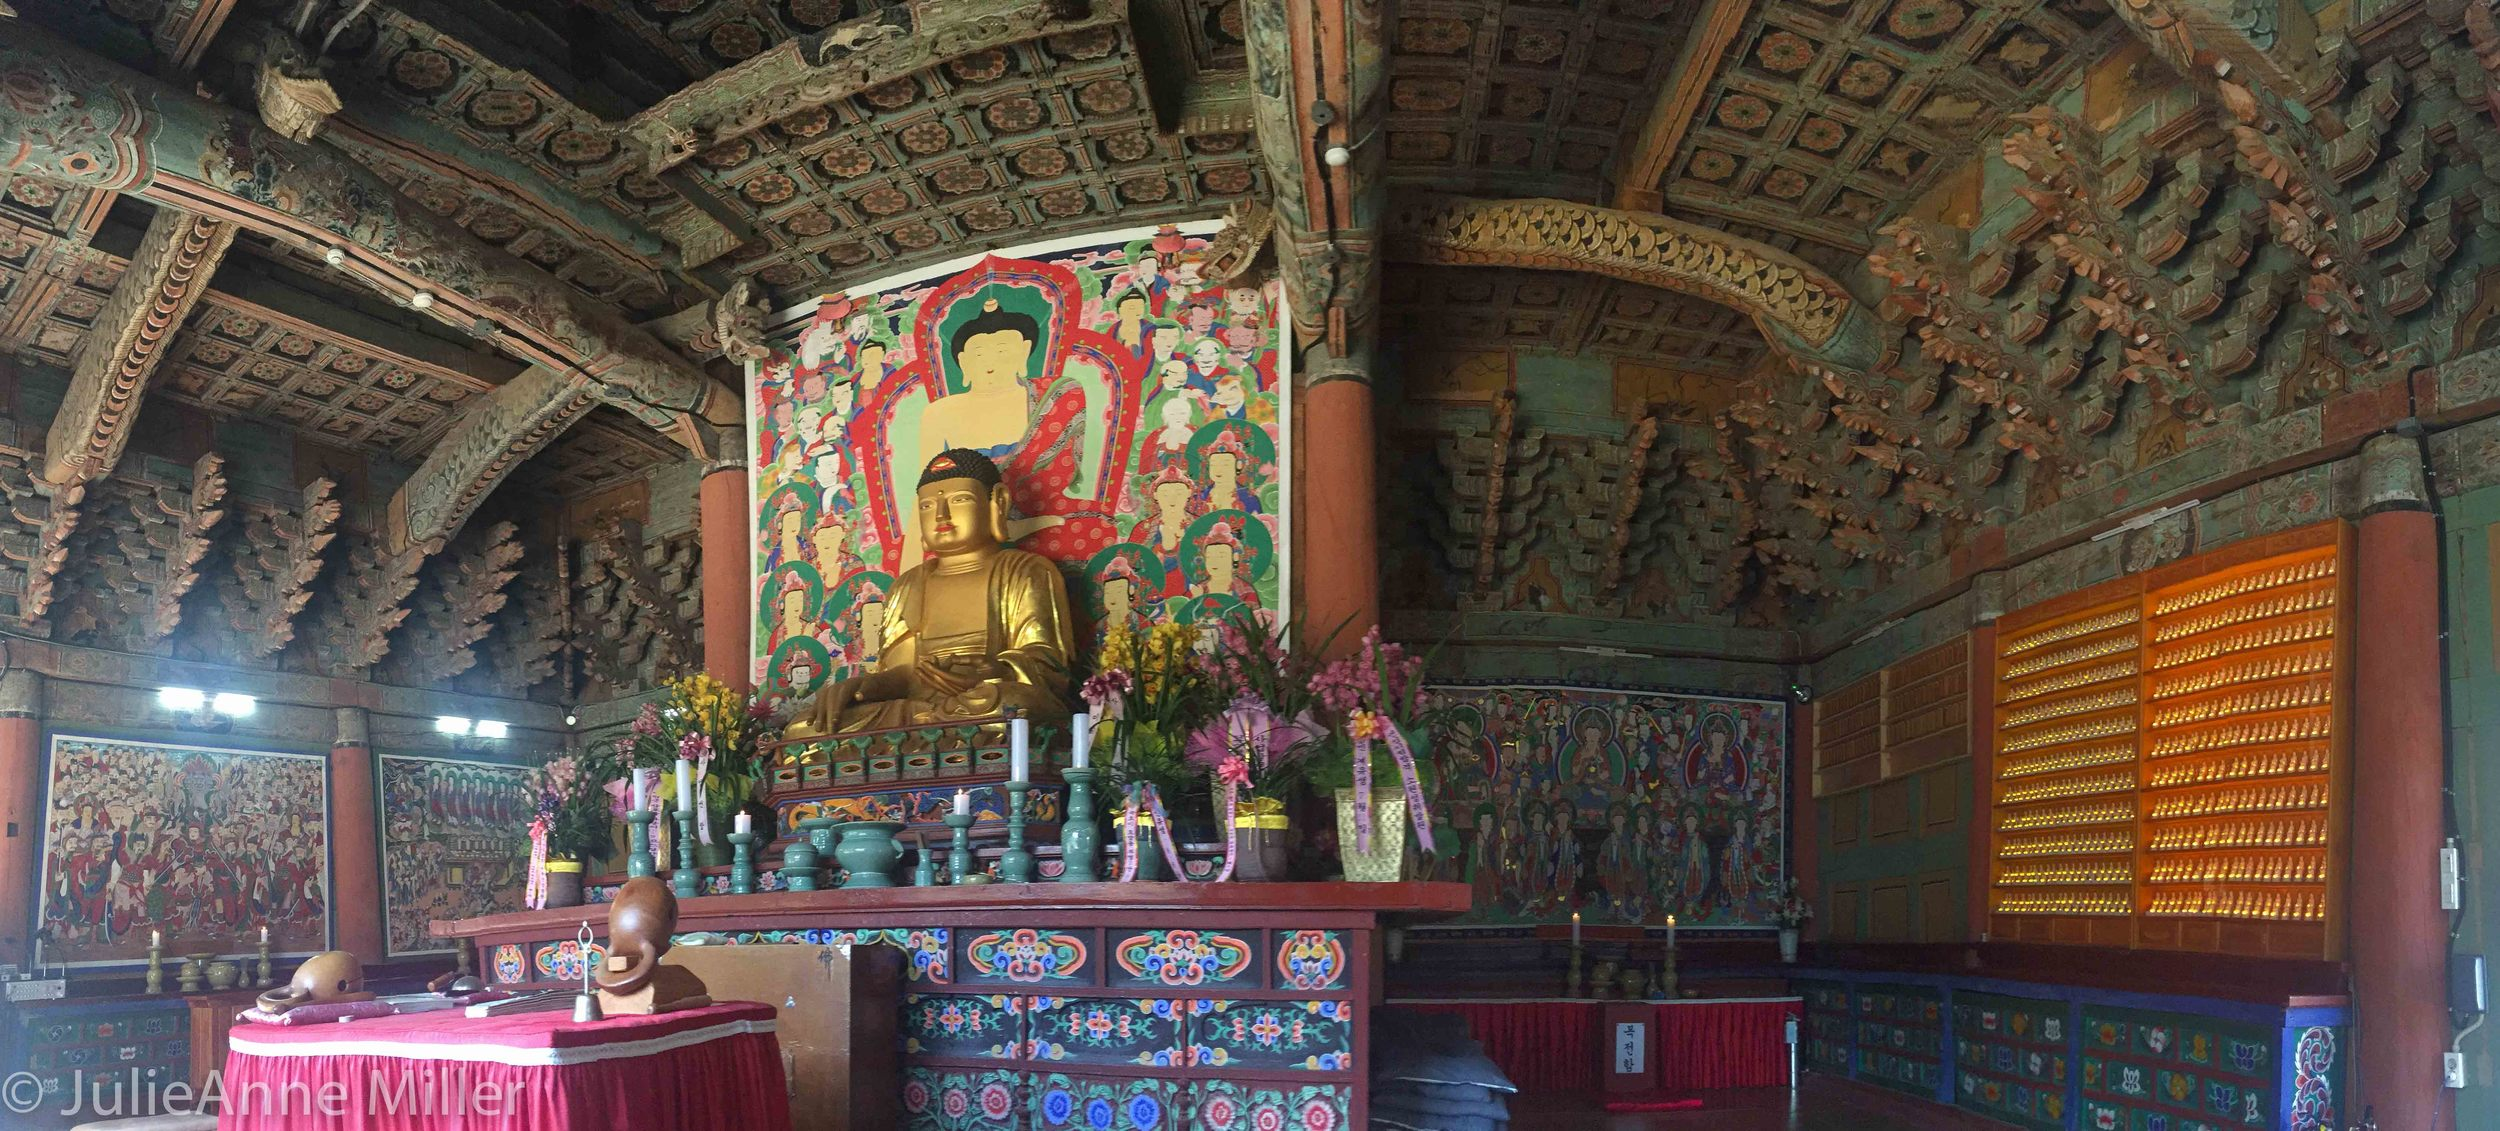 inside great hall